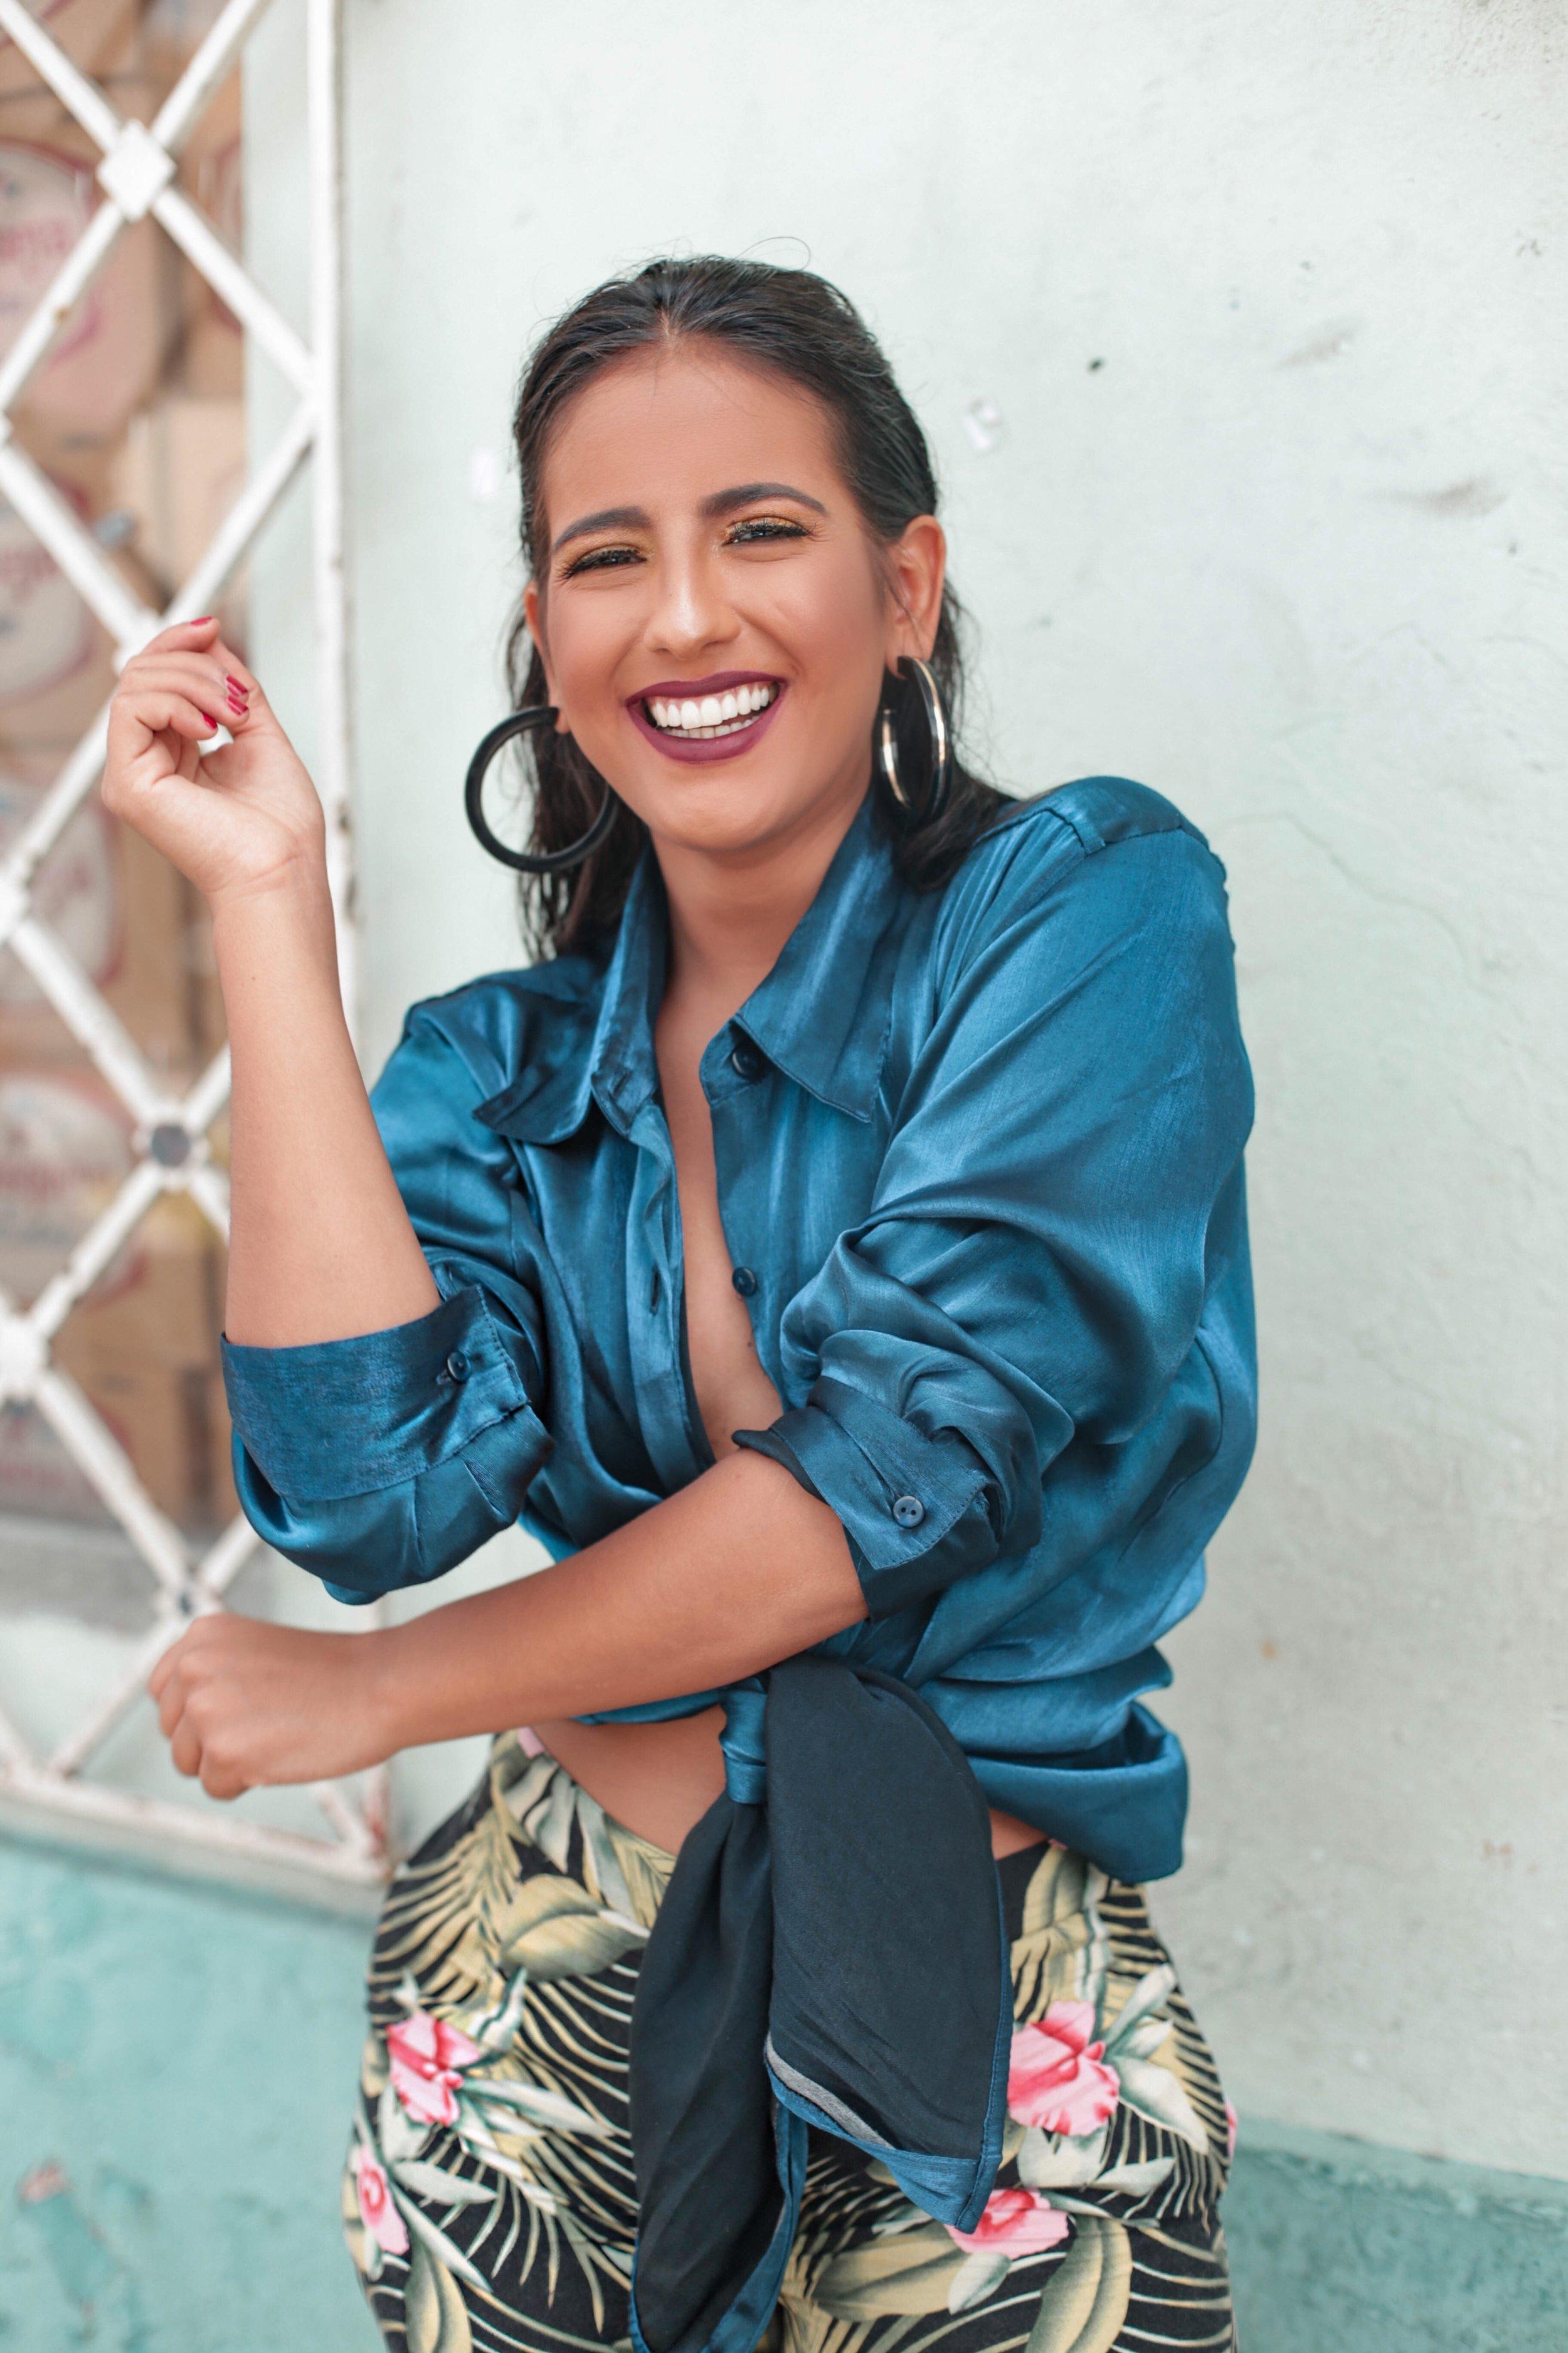 fashion travel ideas blogger entrepreneur empowerment coolness